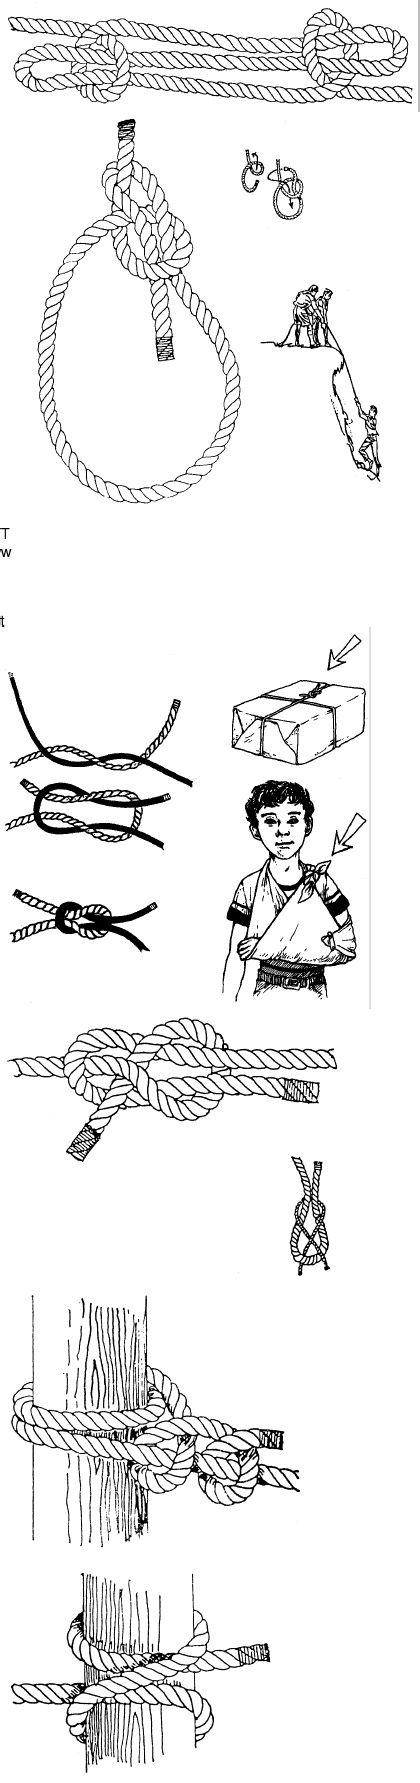 basic book of knots and lashings